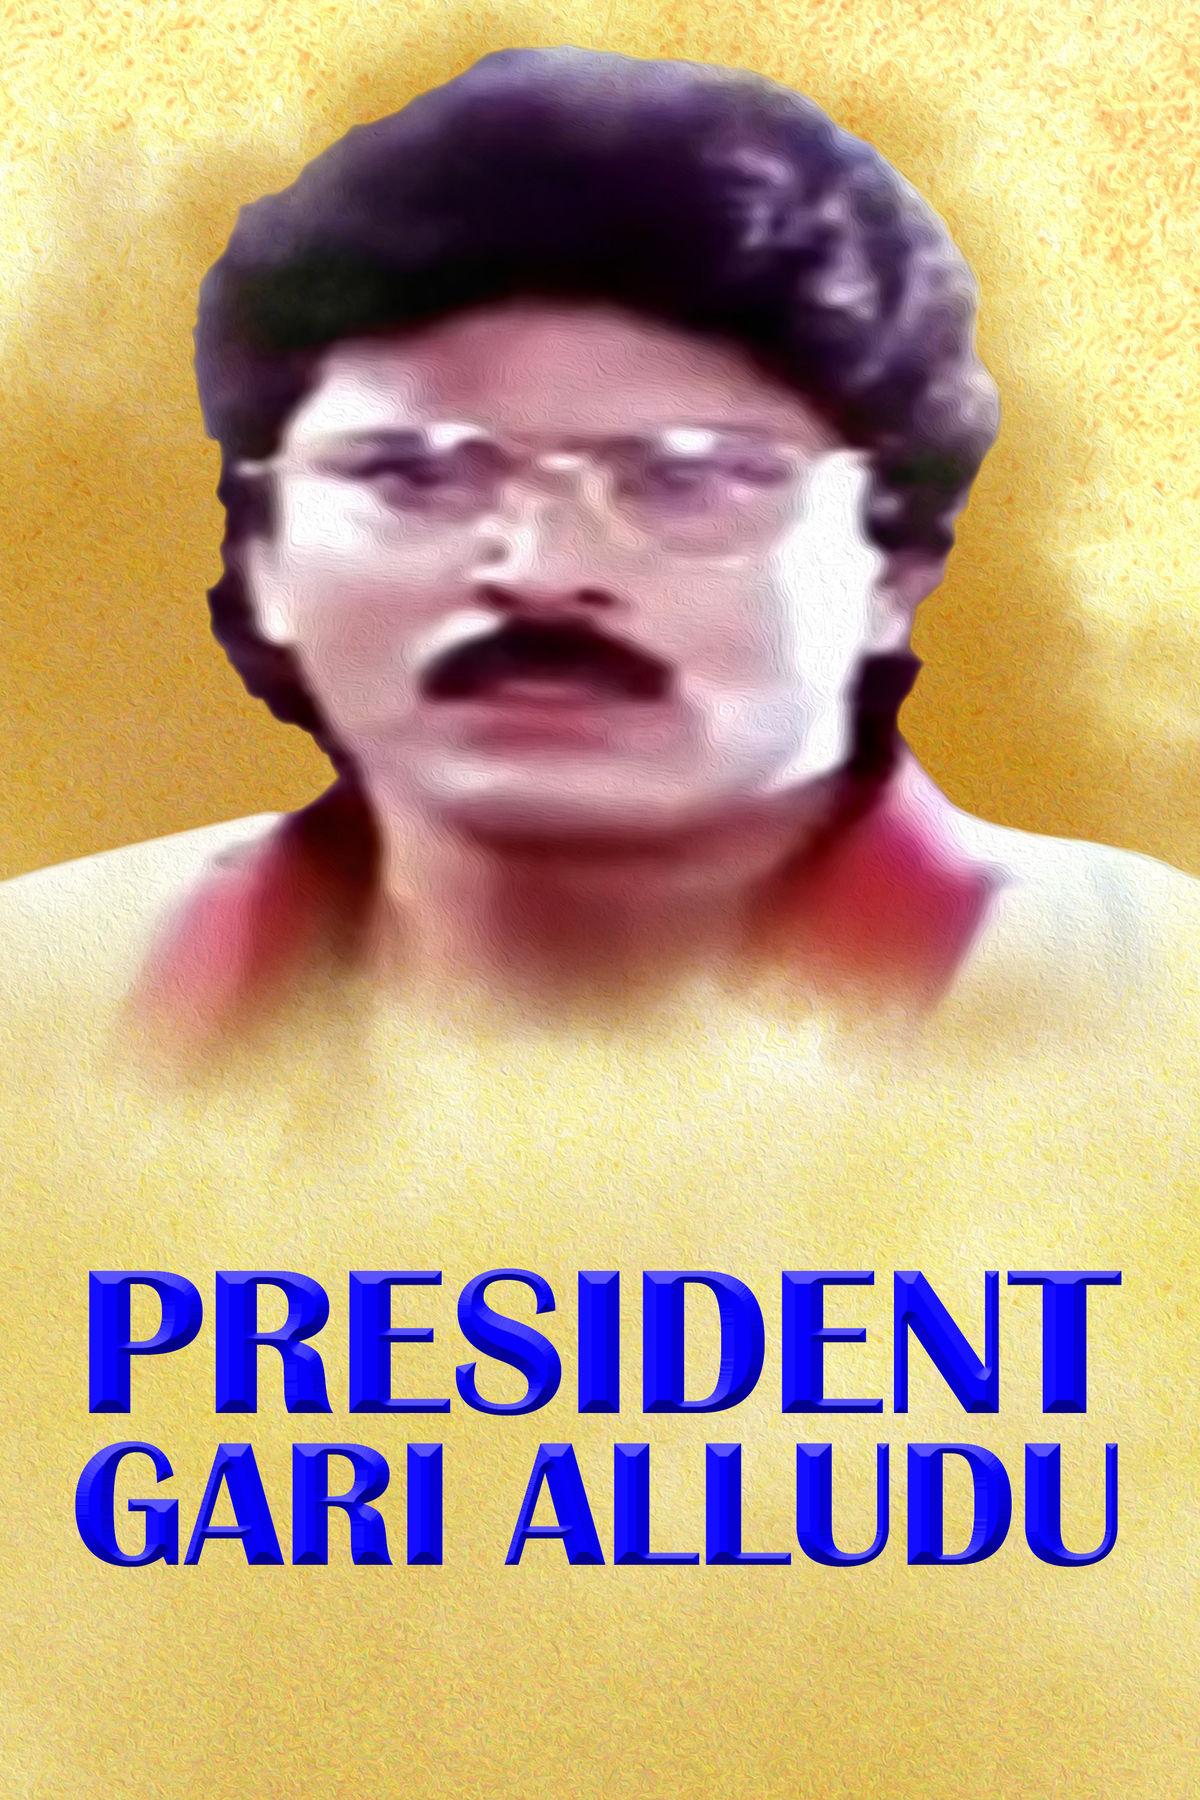 President Gari Alludu